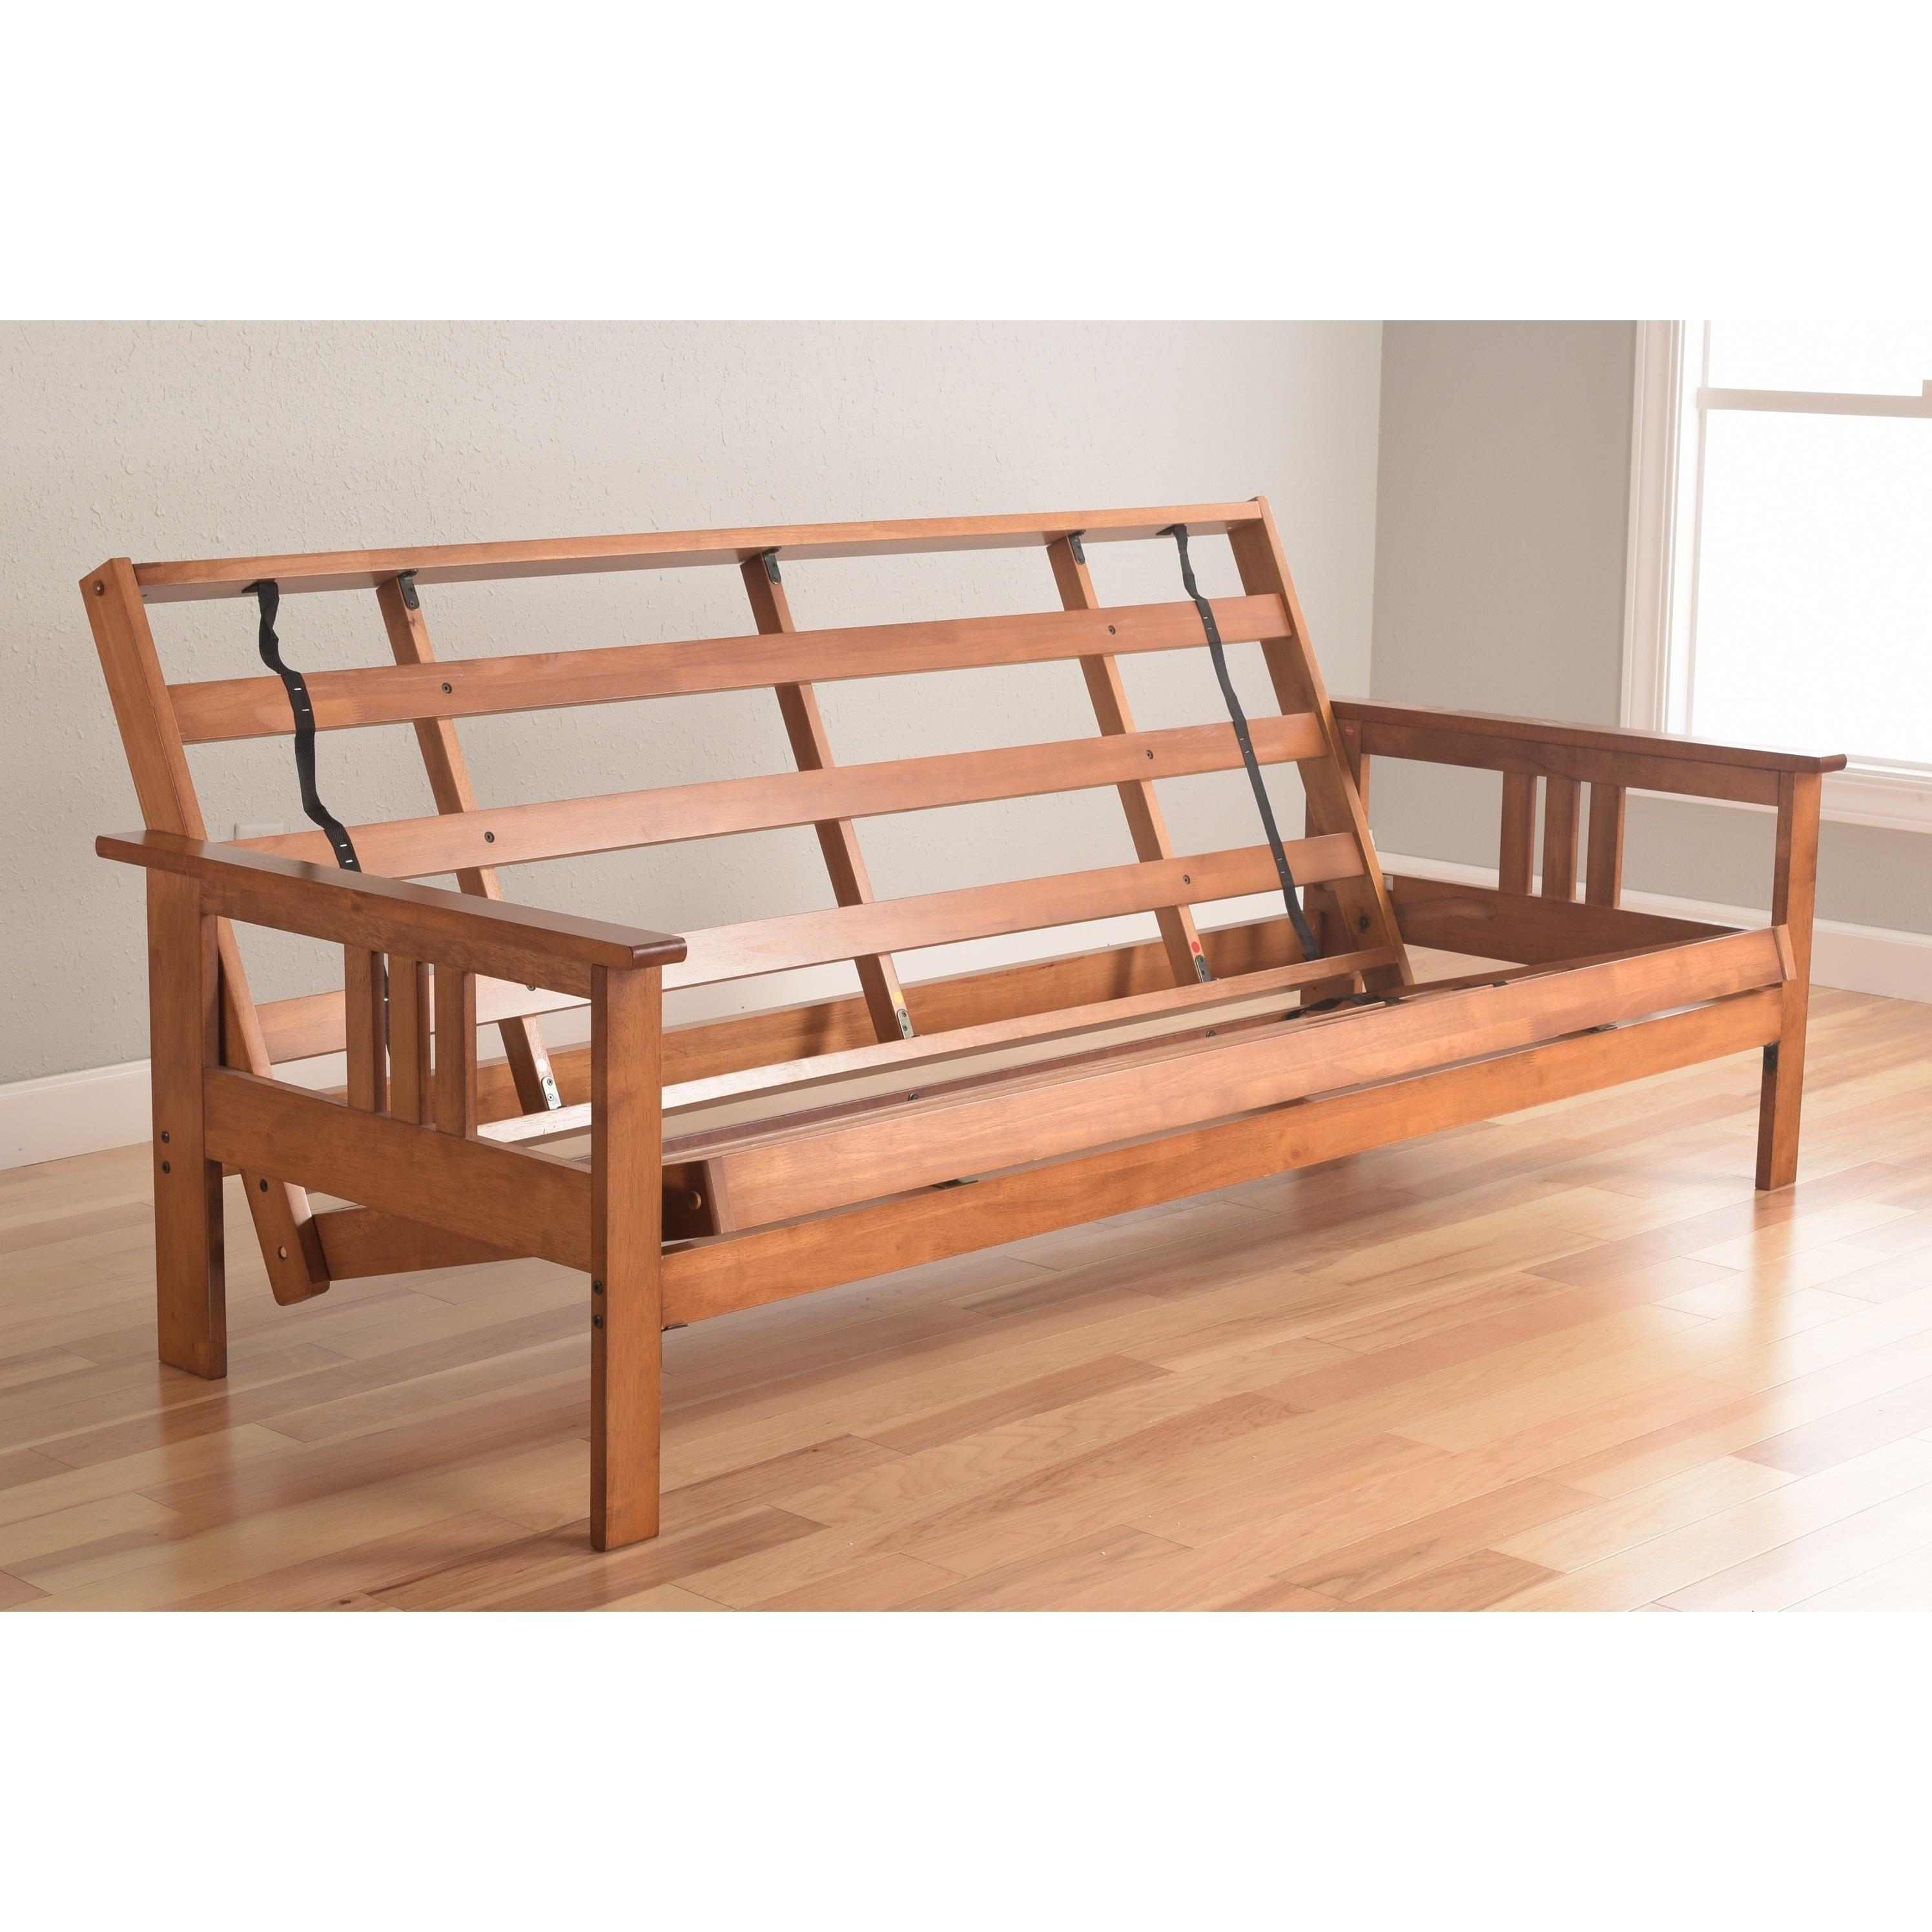 Somette Beli Mont Multi Flex Honey Oak Full Size Wood Futon Frame Free Shipping Today Com 20603077